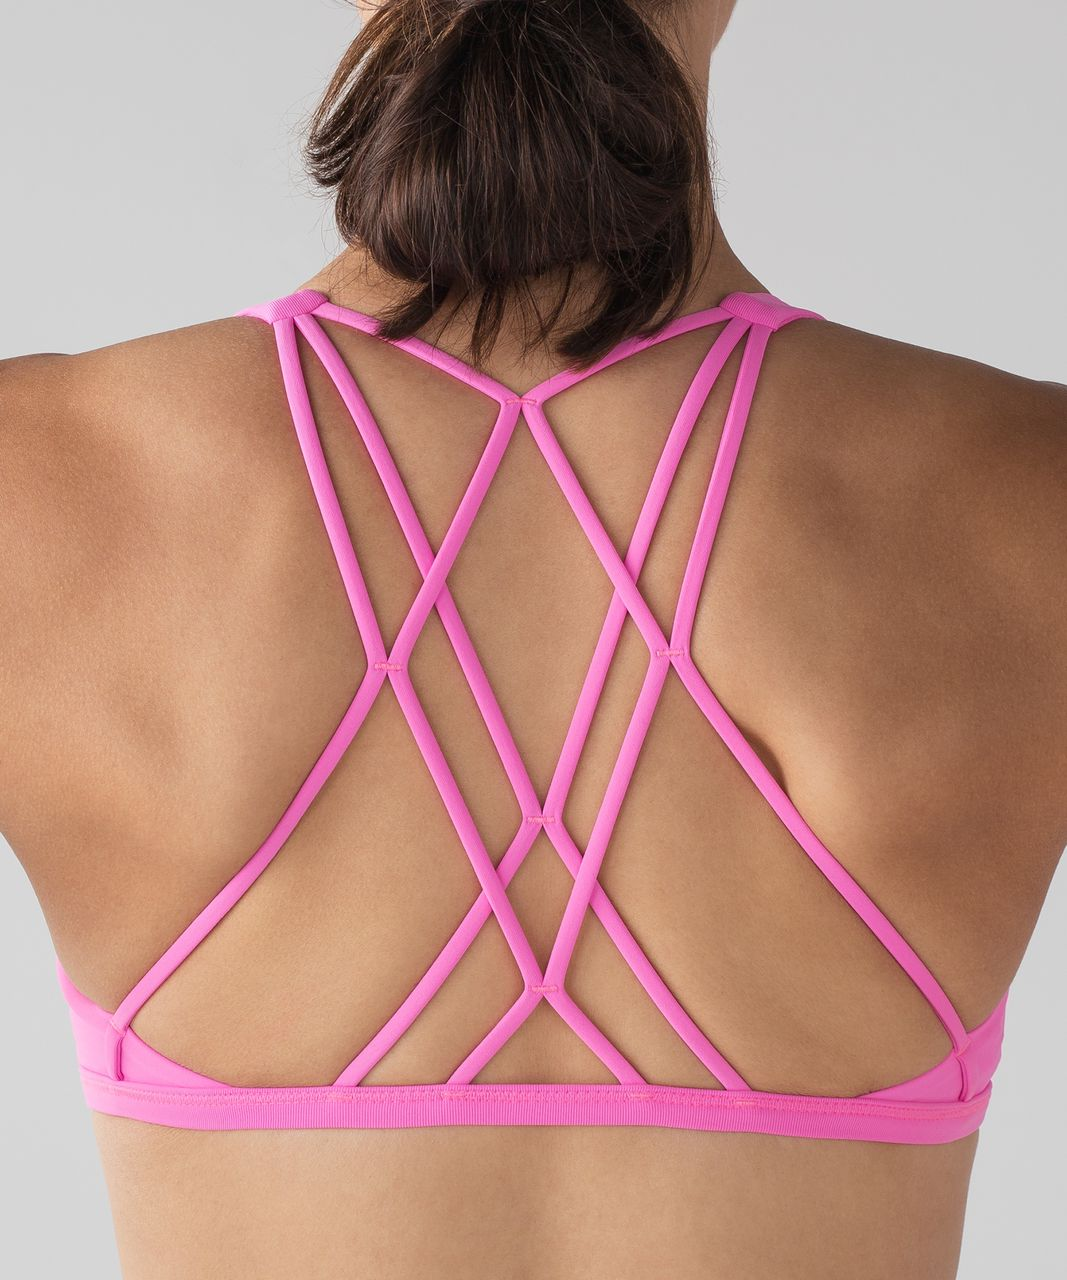 Lululemon Free To Be Zen Bra - Dark Prism Pink